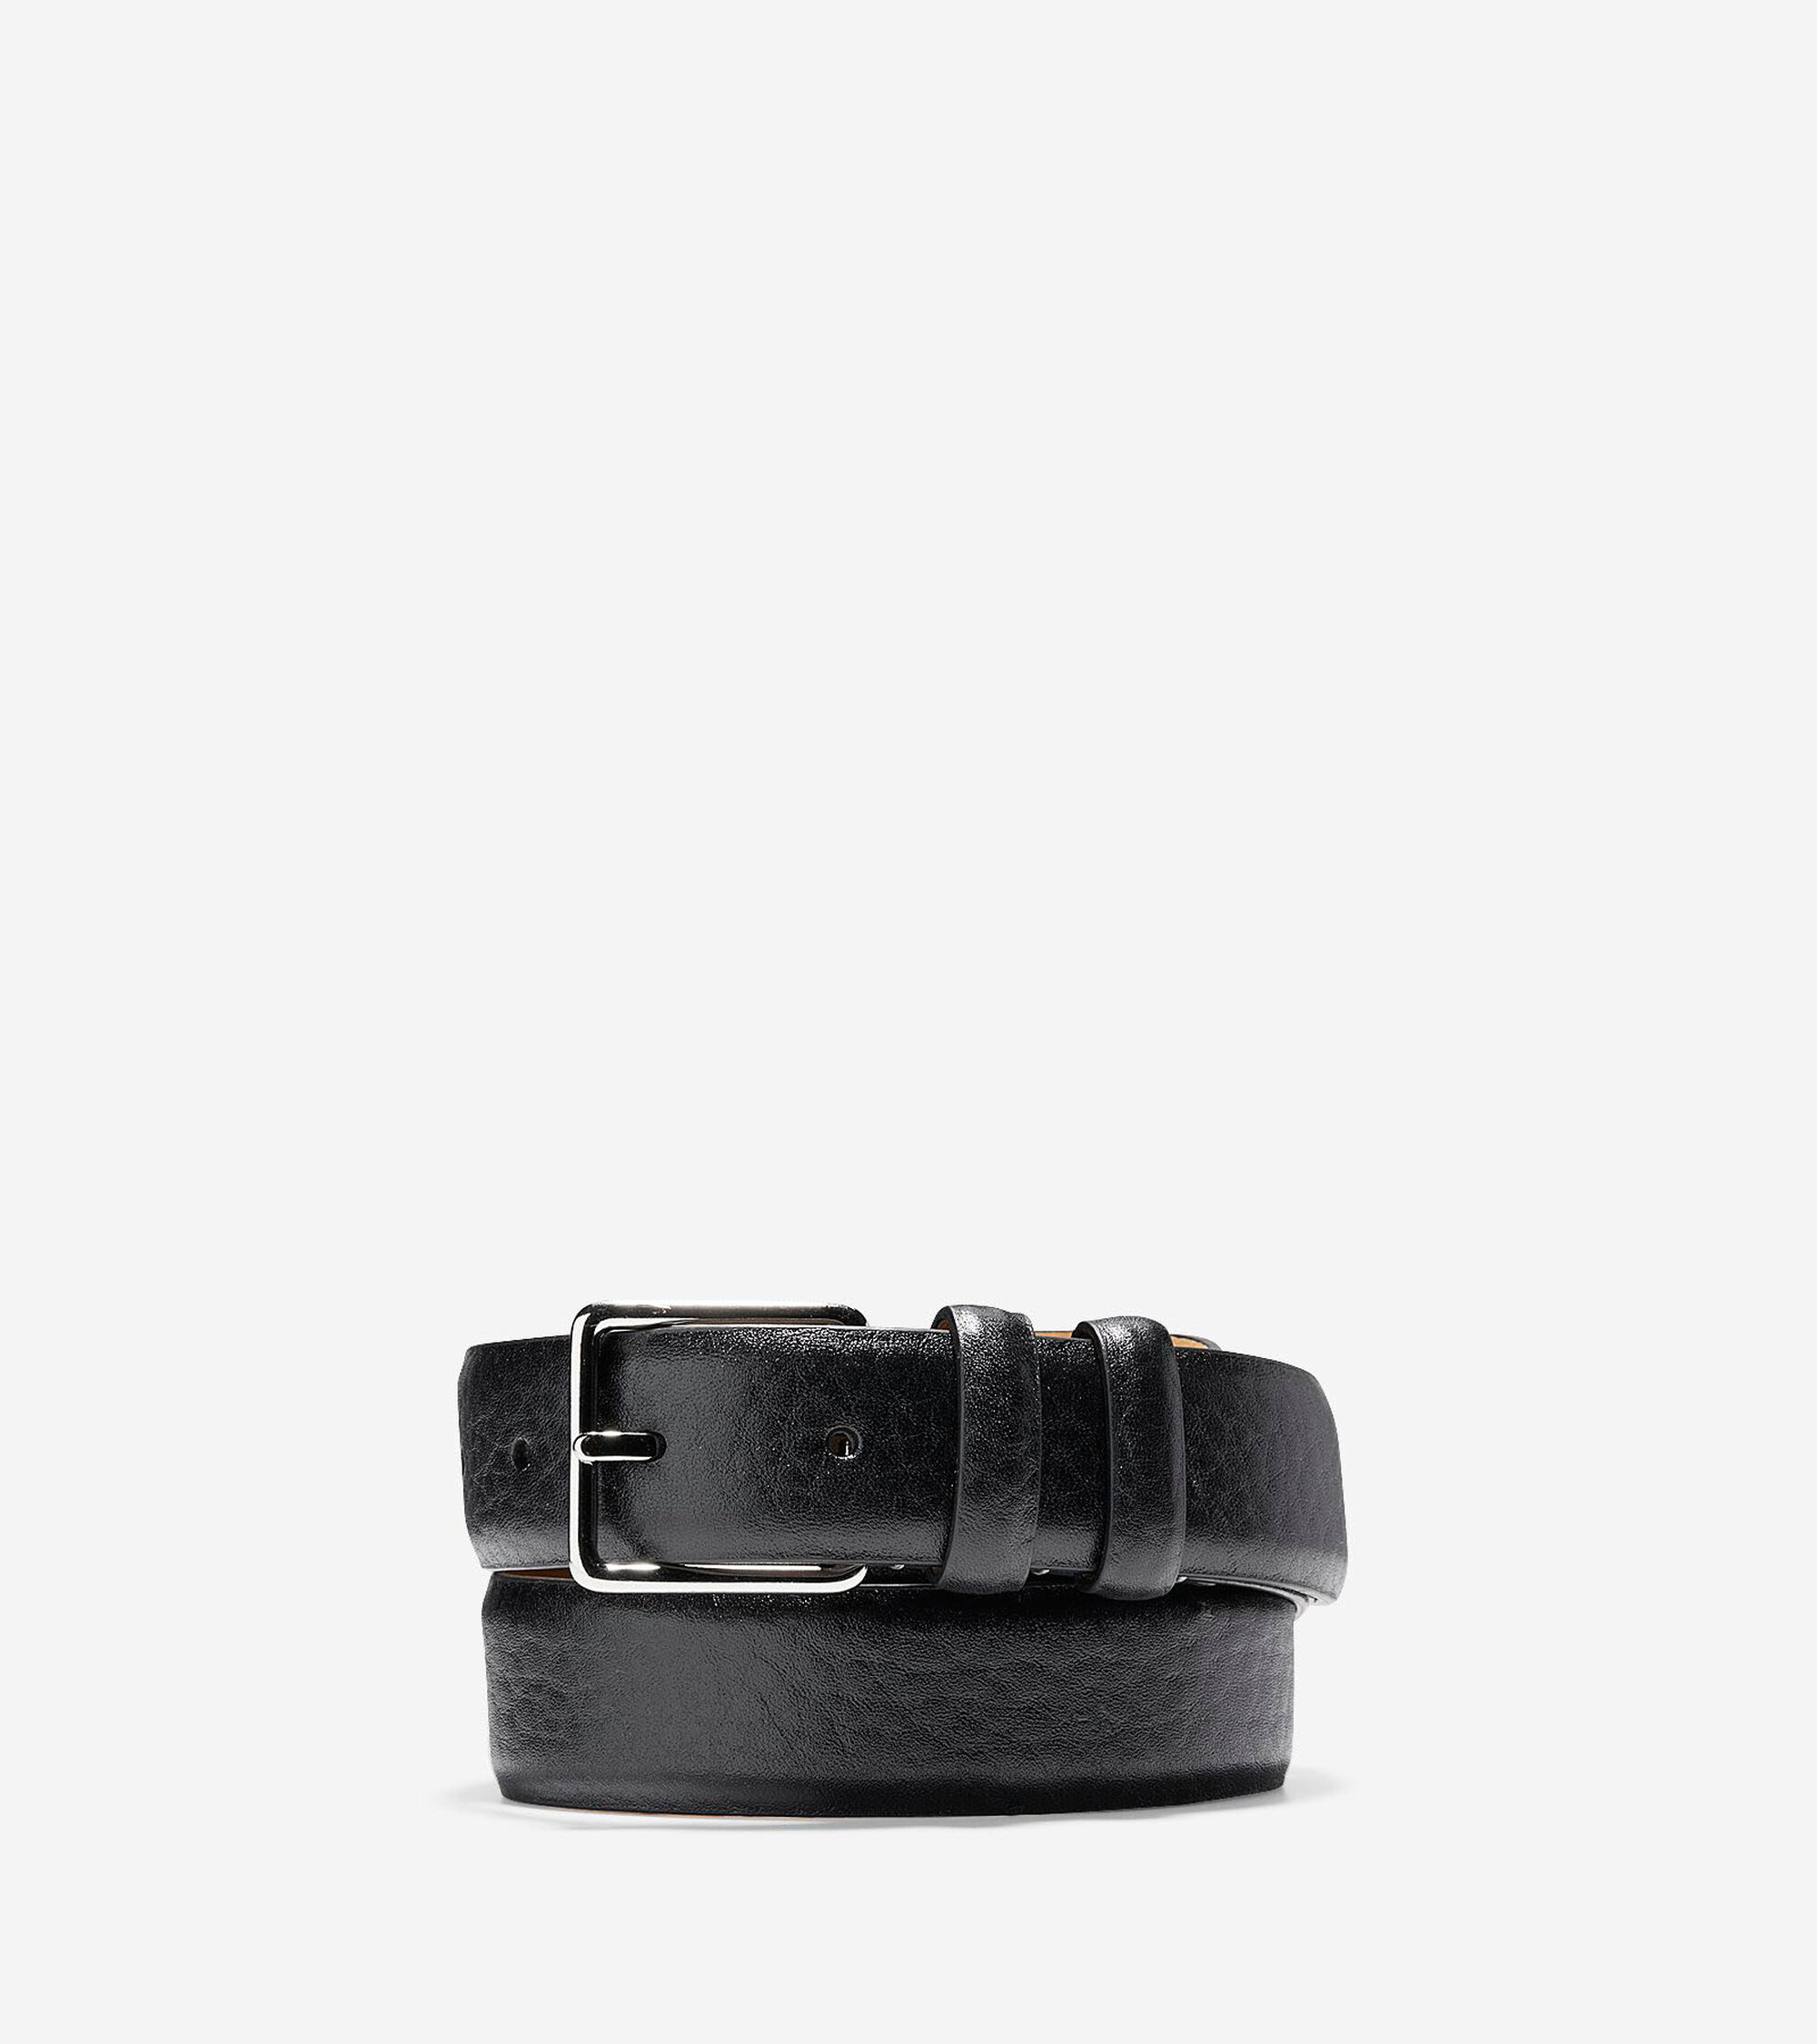 Accessories > 32mm Feather Edge Strap Belt